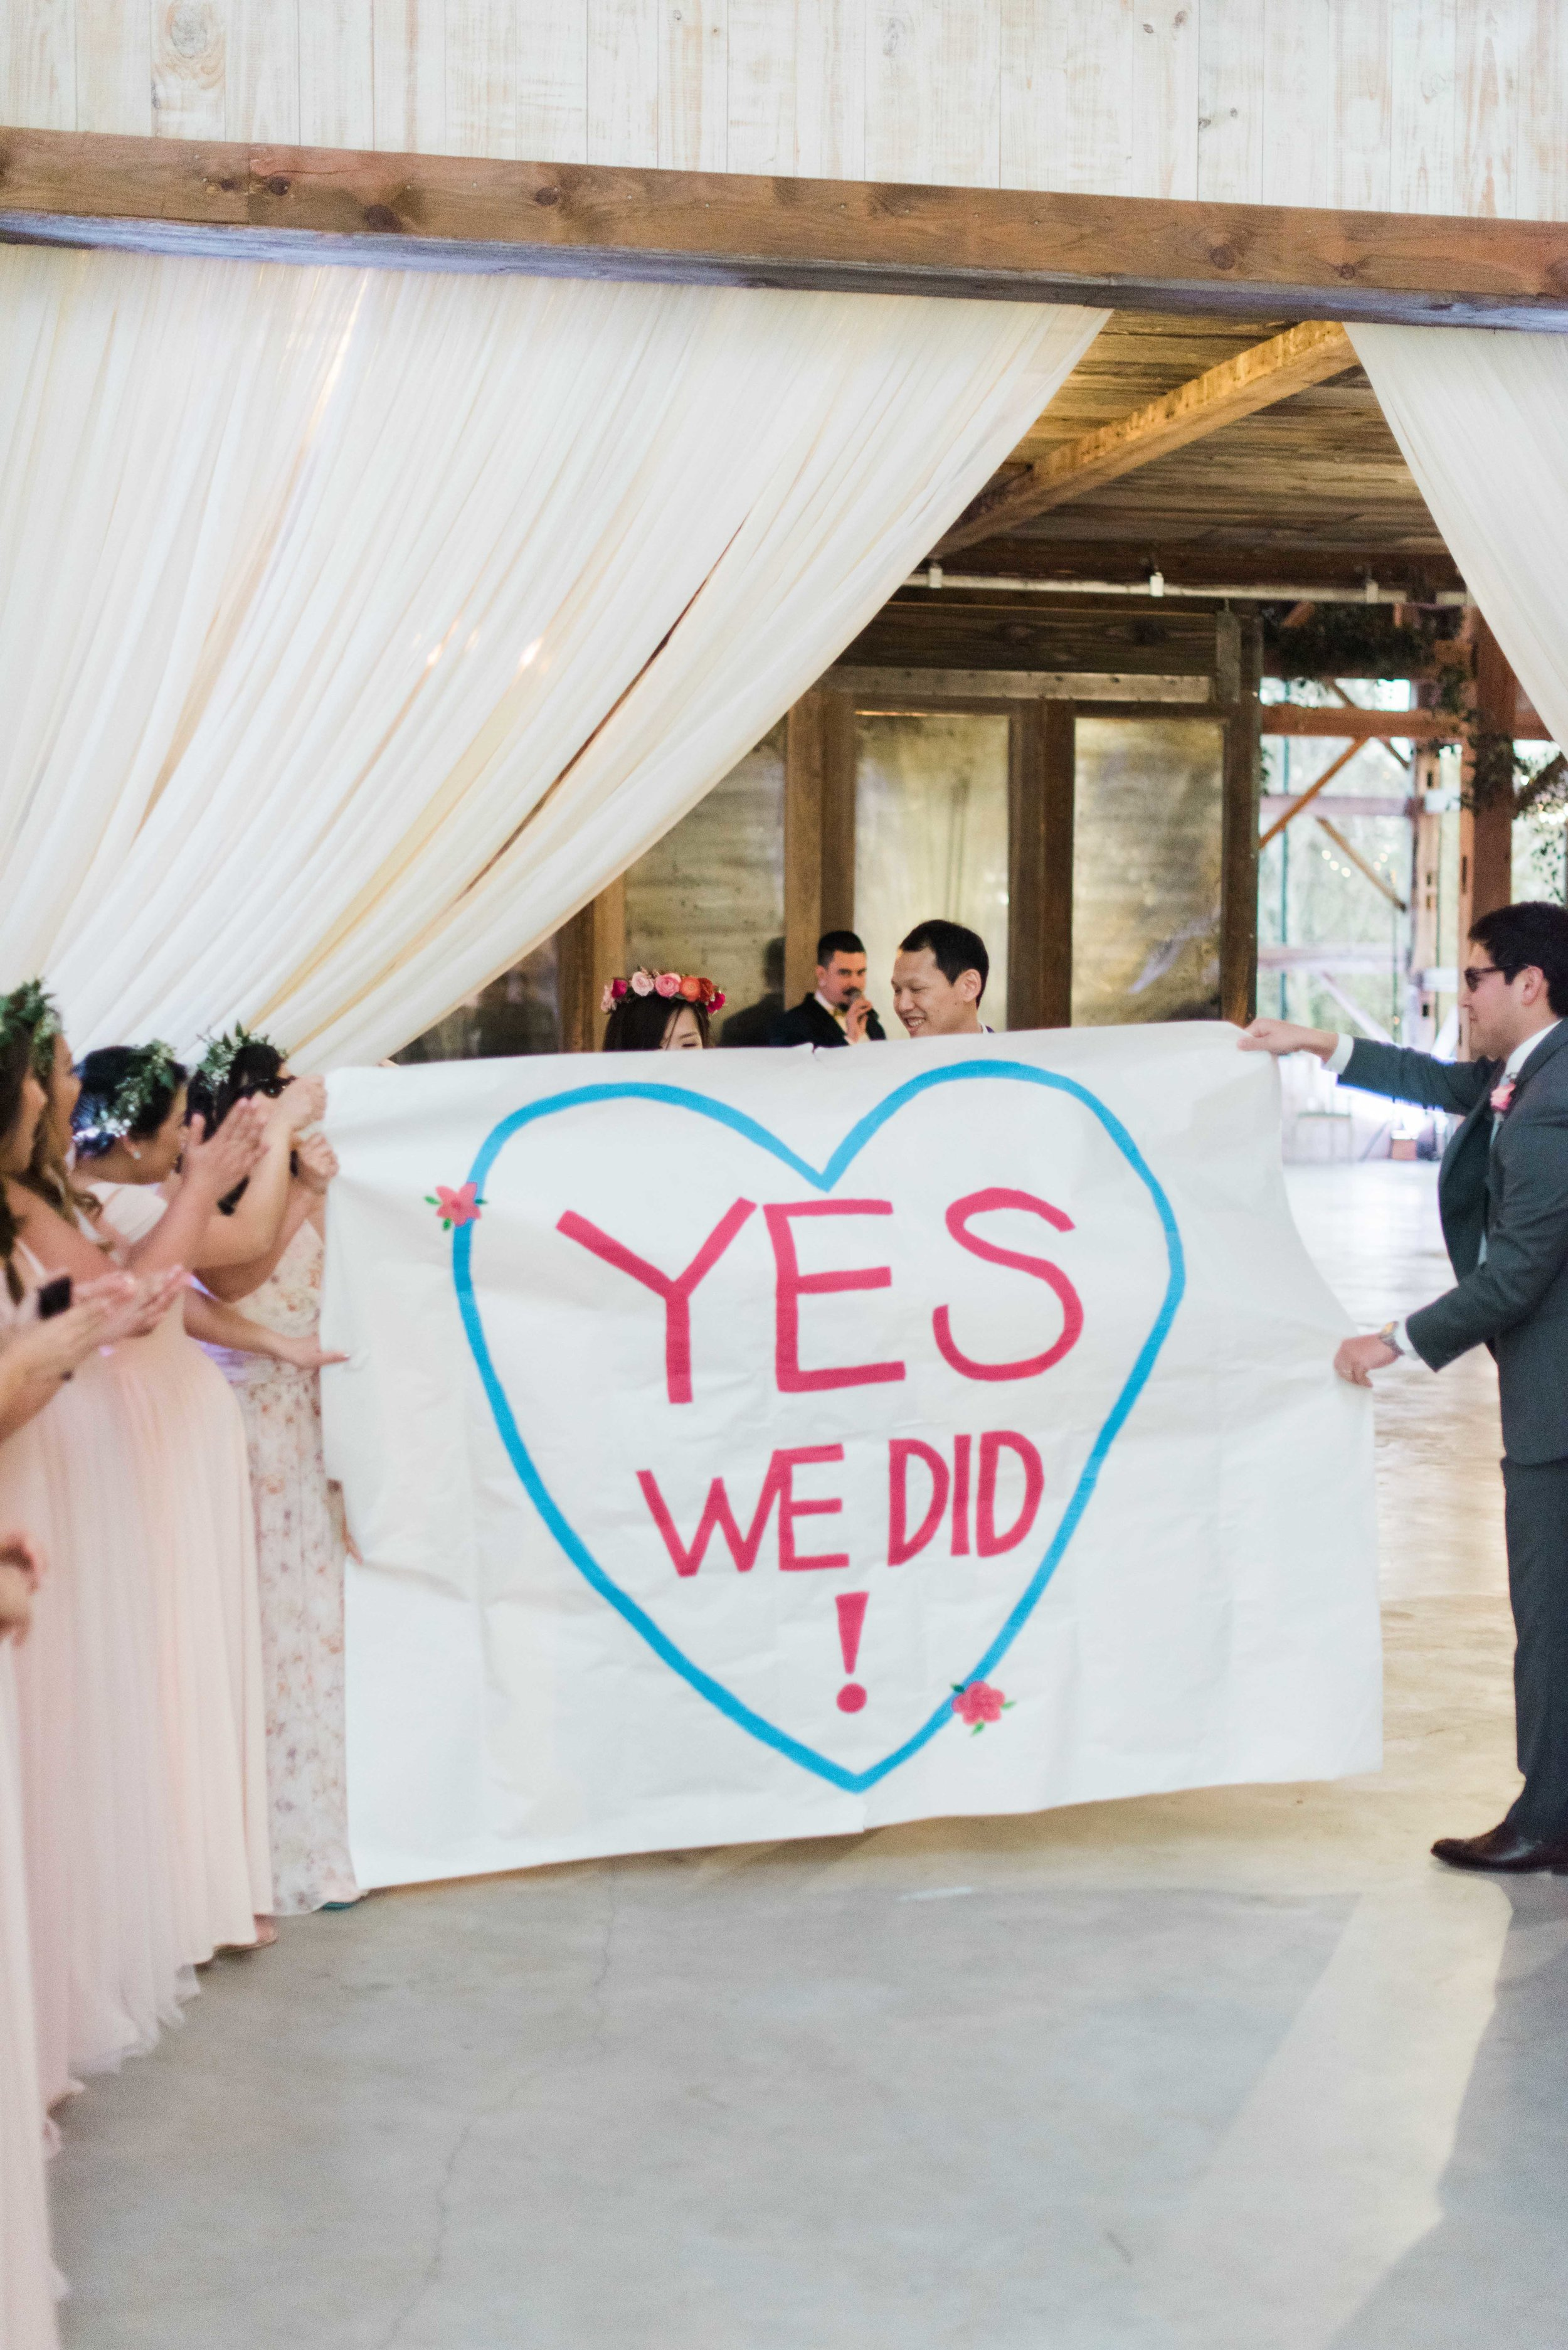 The-Knot-50-Weddings-50-States-Texas-Winner-Dana-Fernandez-photography-houston-wedding-photographer-film-fine-art-destination-42.jpg